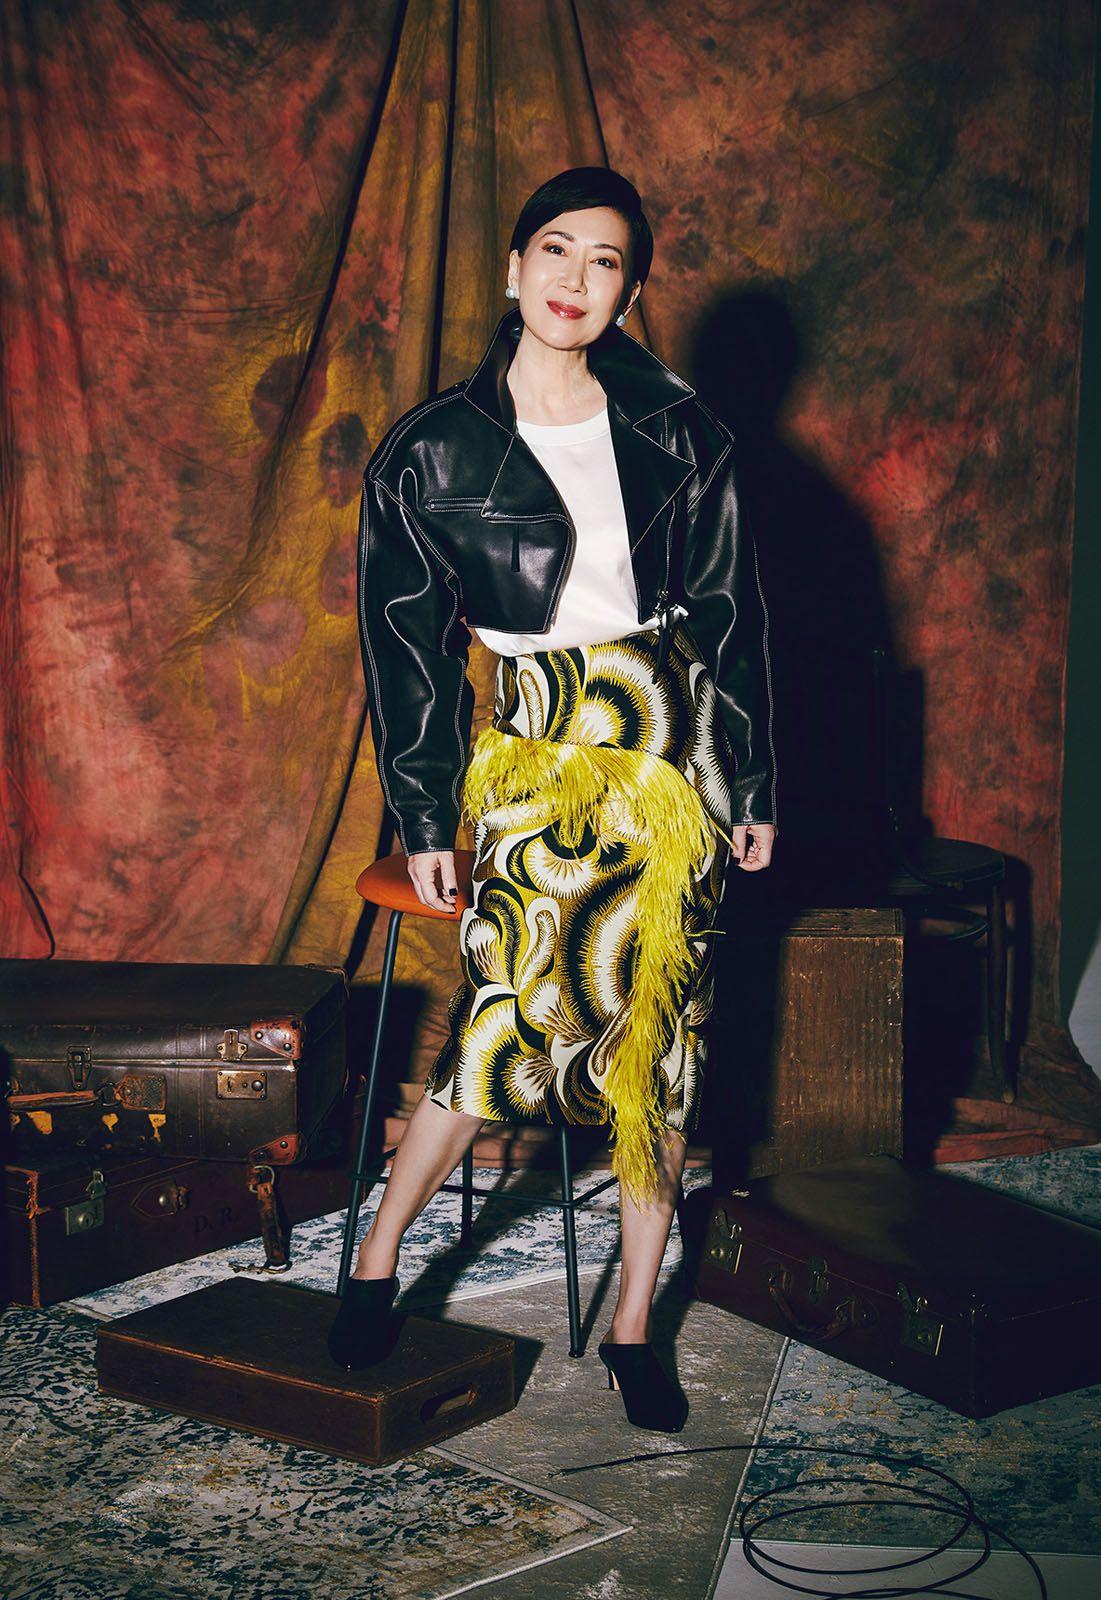 Nancy wears Marni jacket, Emporia Armani blouse, Dries Van Noten skirt, Stuart Weitzman heels and Papally earrings, all Nancy's own; crystal ear cuff by Fendi